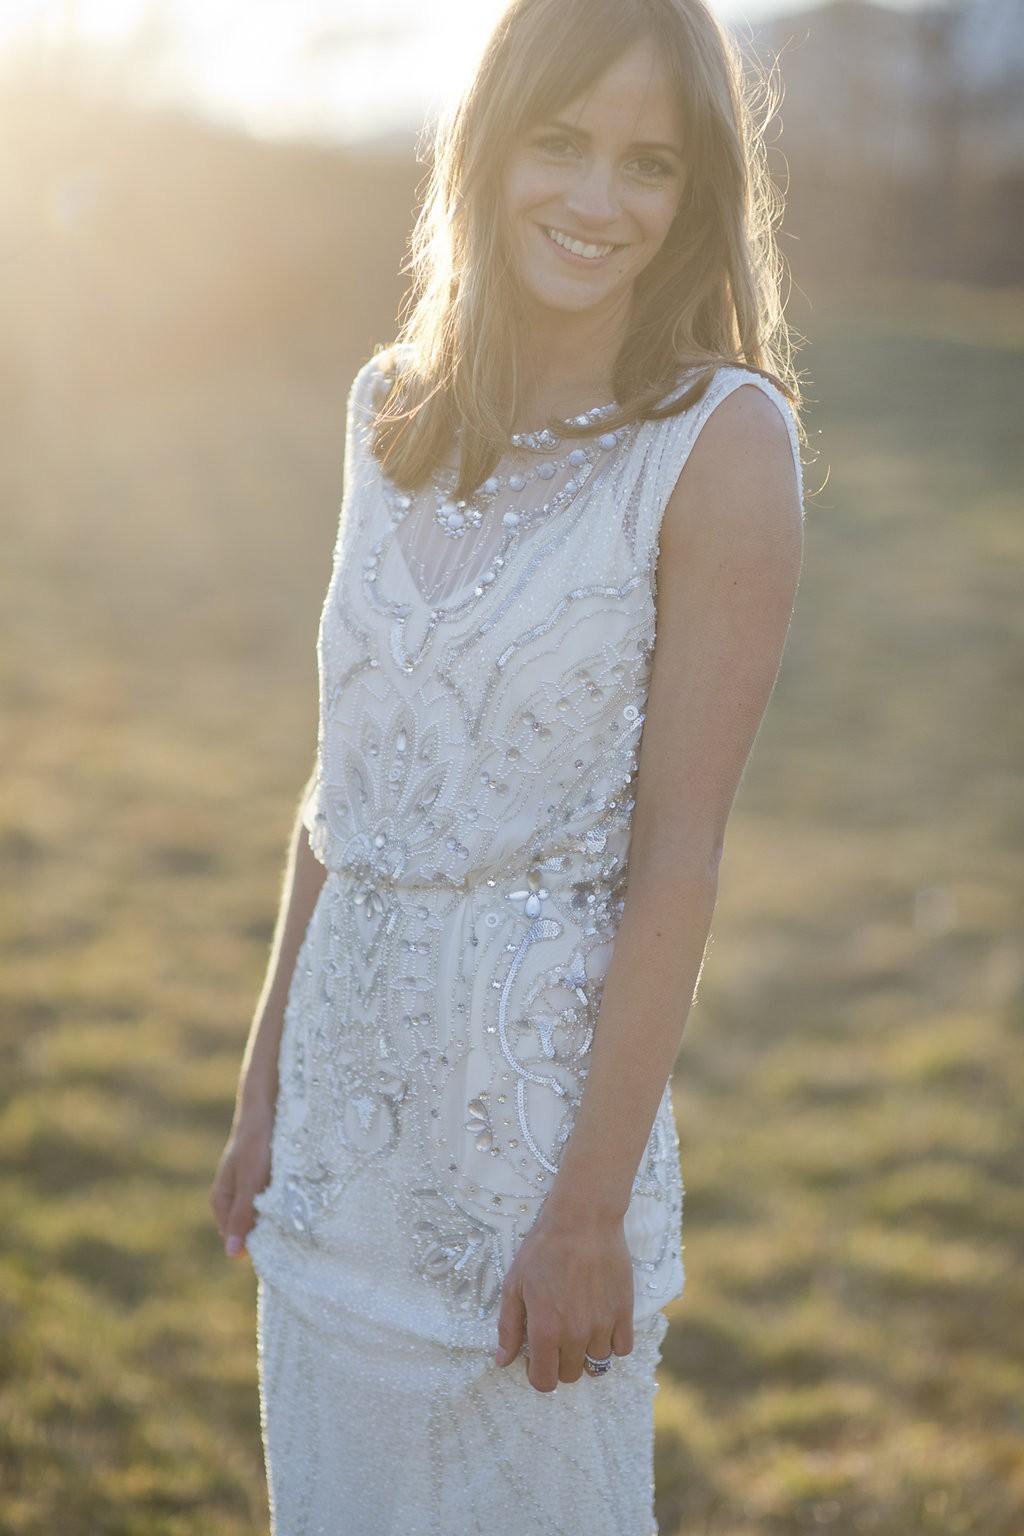 Jenny Packham Esme Second Hand Wedding Dress on Sale 33% Off